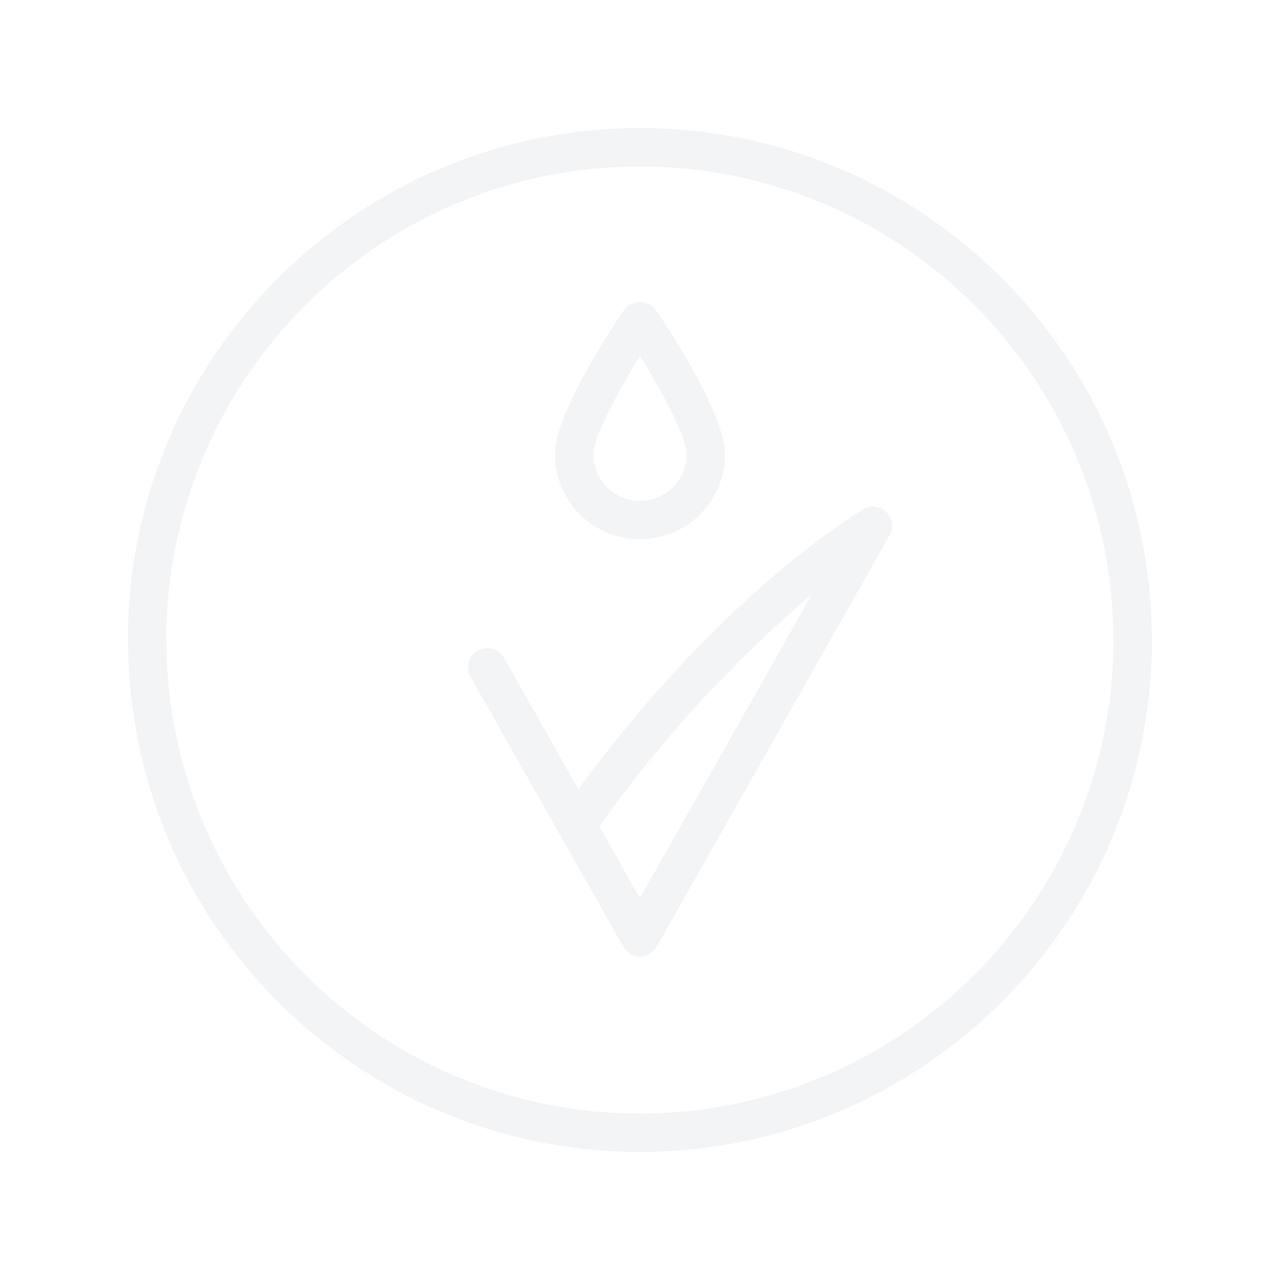 MIZON Joyful Time Essence Bamboo Mask 23g